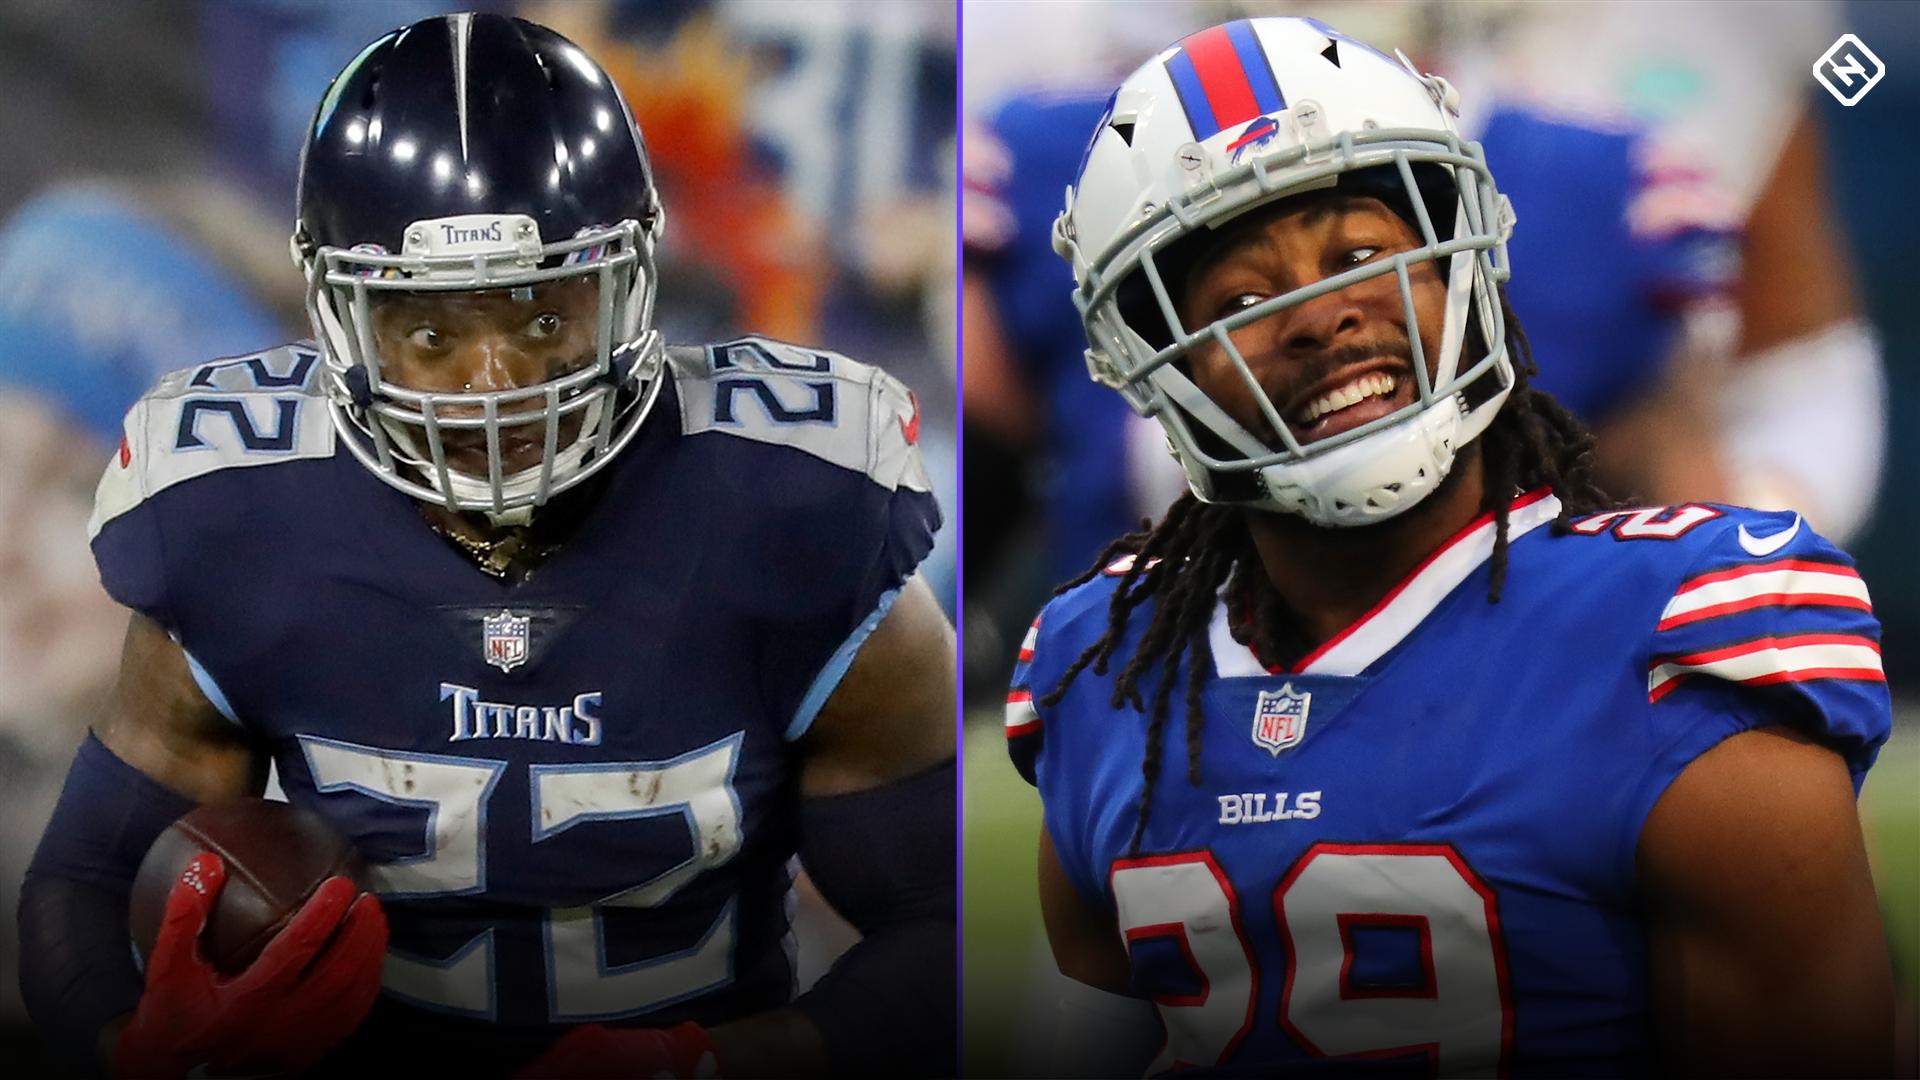 Revisiting Derrick Henry's epic stiff-arm on Josh Norman in 2020 Titans vs. Bills game